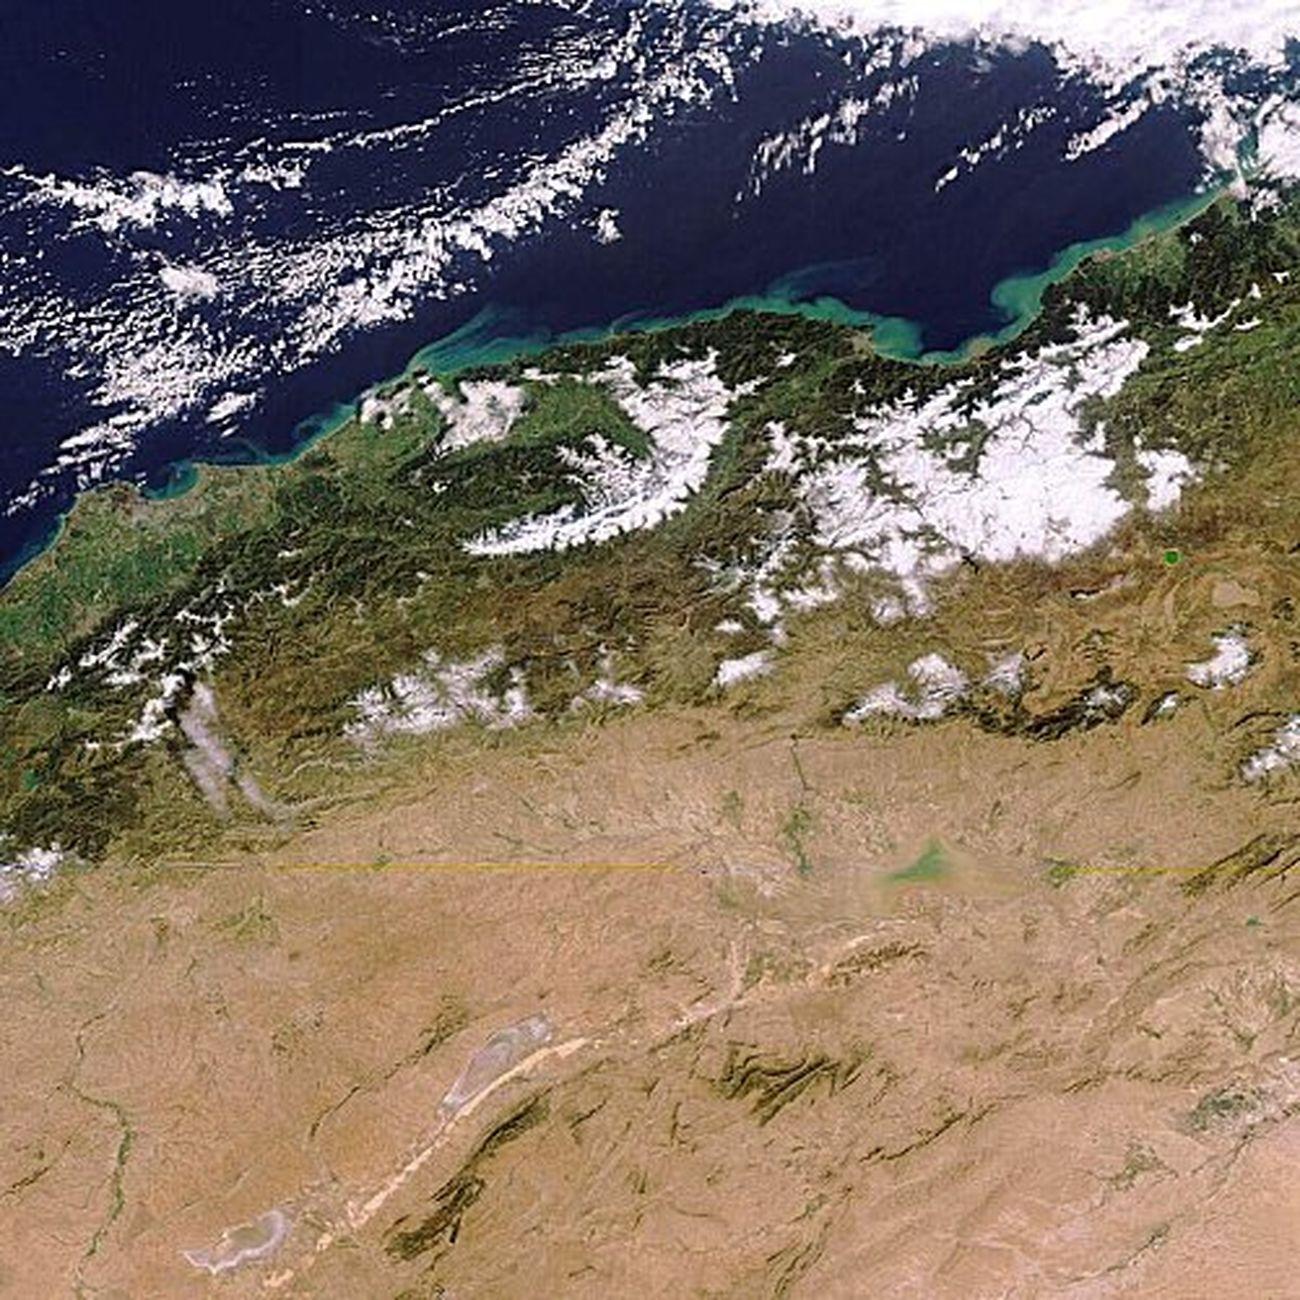 Algérie vue du ciel... Draria